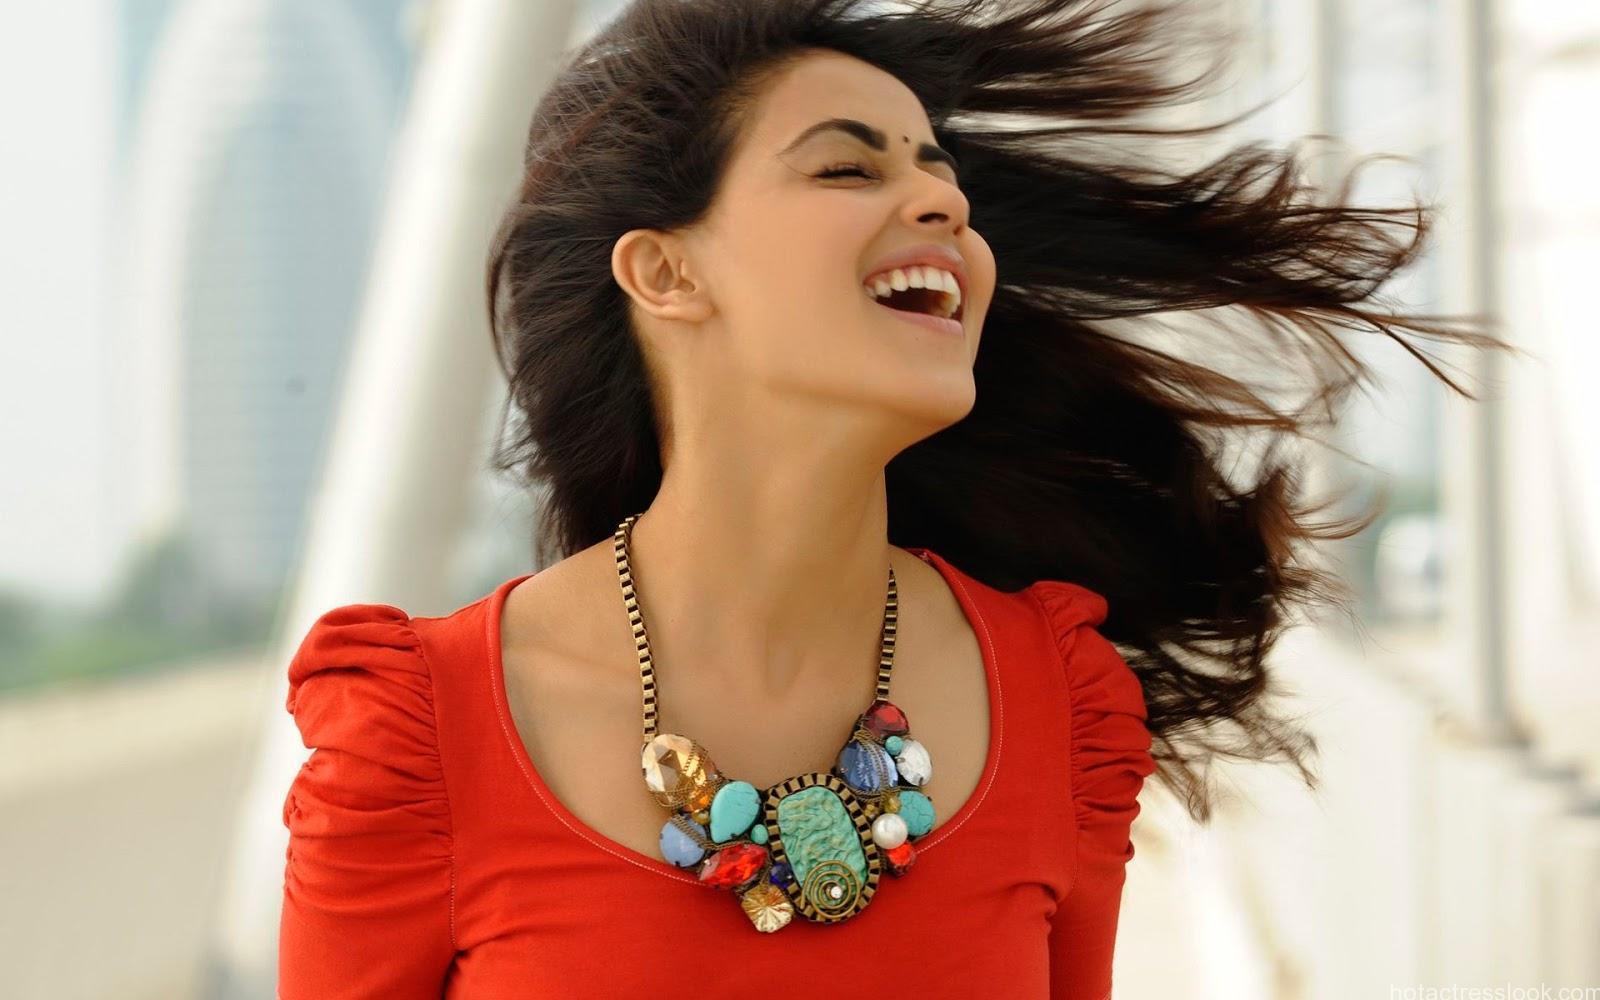 Genelia D'Souza cute smiling Hd Wallpapers